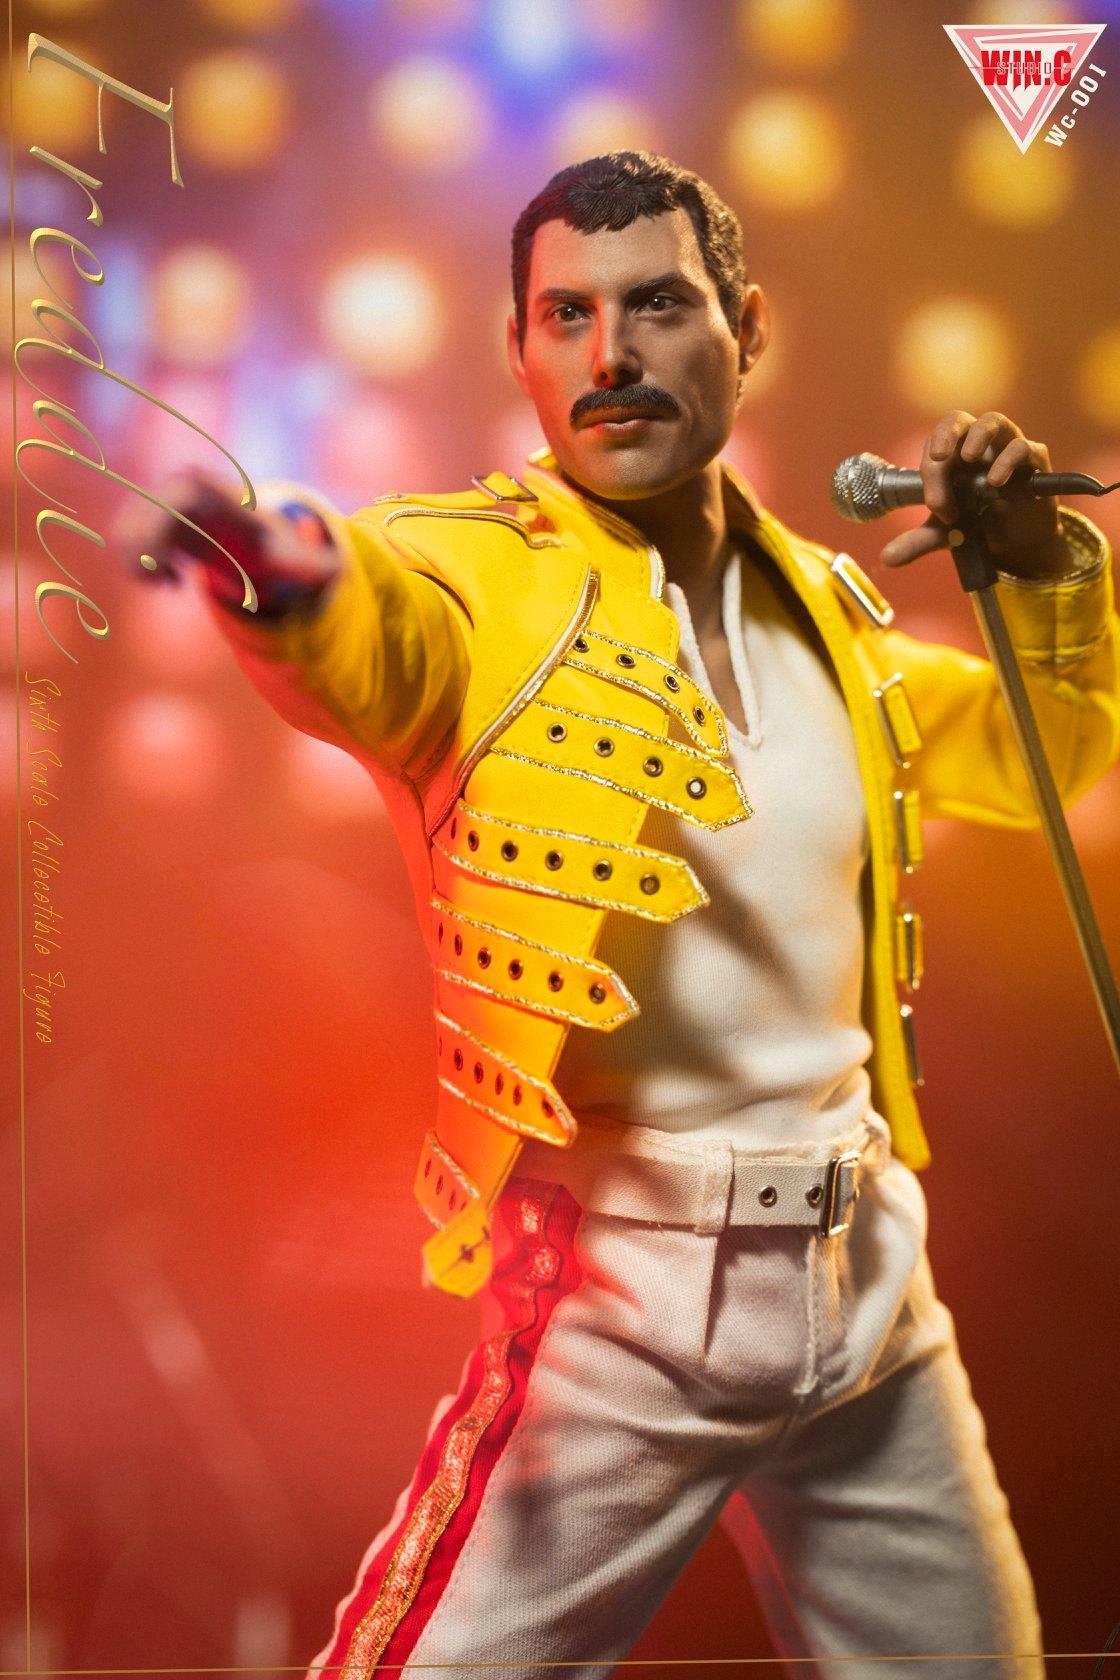 Win.C Studio: Freddie Mercury Set